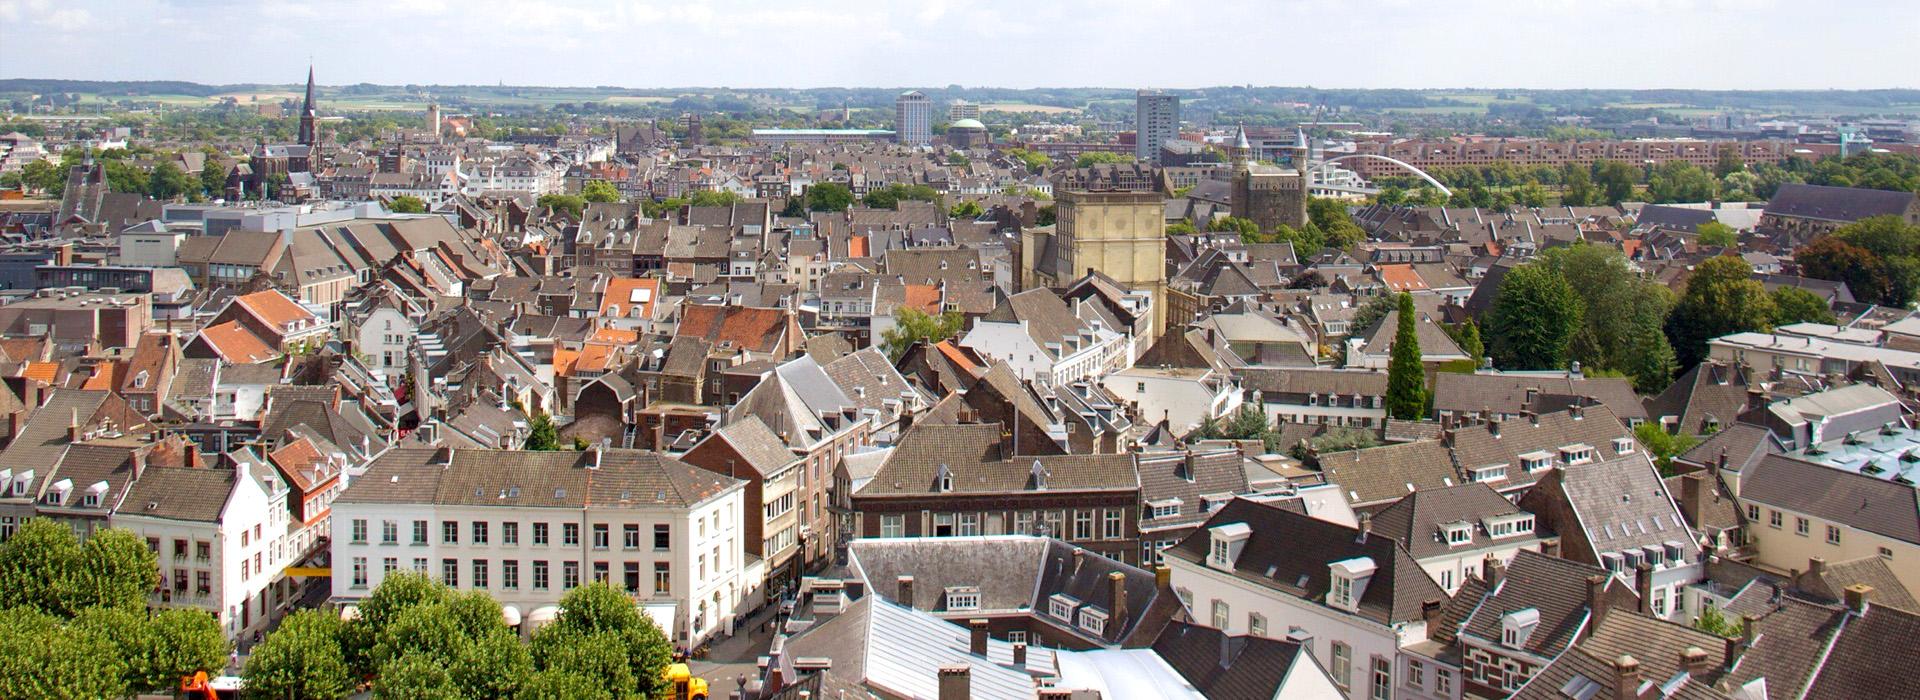 aerial view of dutch town maastricht